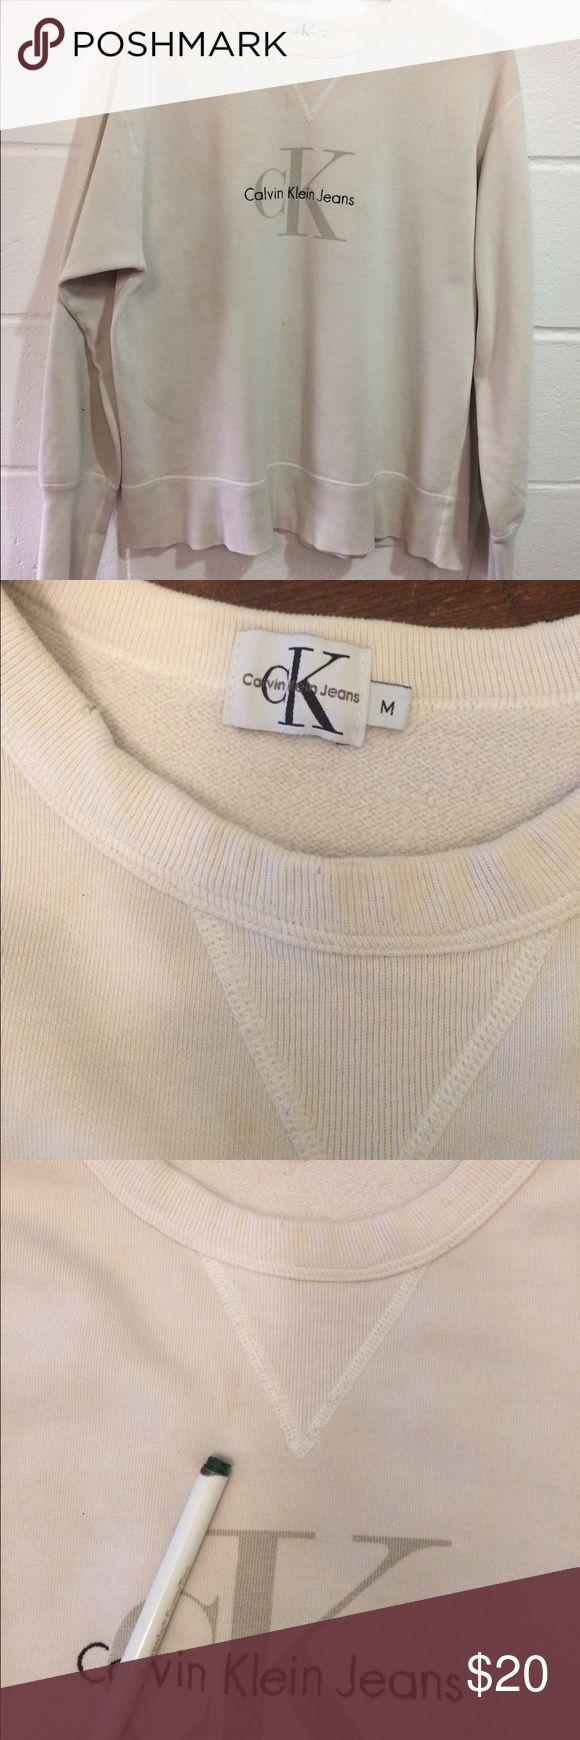 "Vintage Calvin Klein big logo crewneck sweatshirt Men's medium vintage  big ""CK"" logo sweatshirt. Flaws include stains shown in pics. Cream colored. Calvin Klein Sweaters Crewneck"